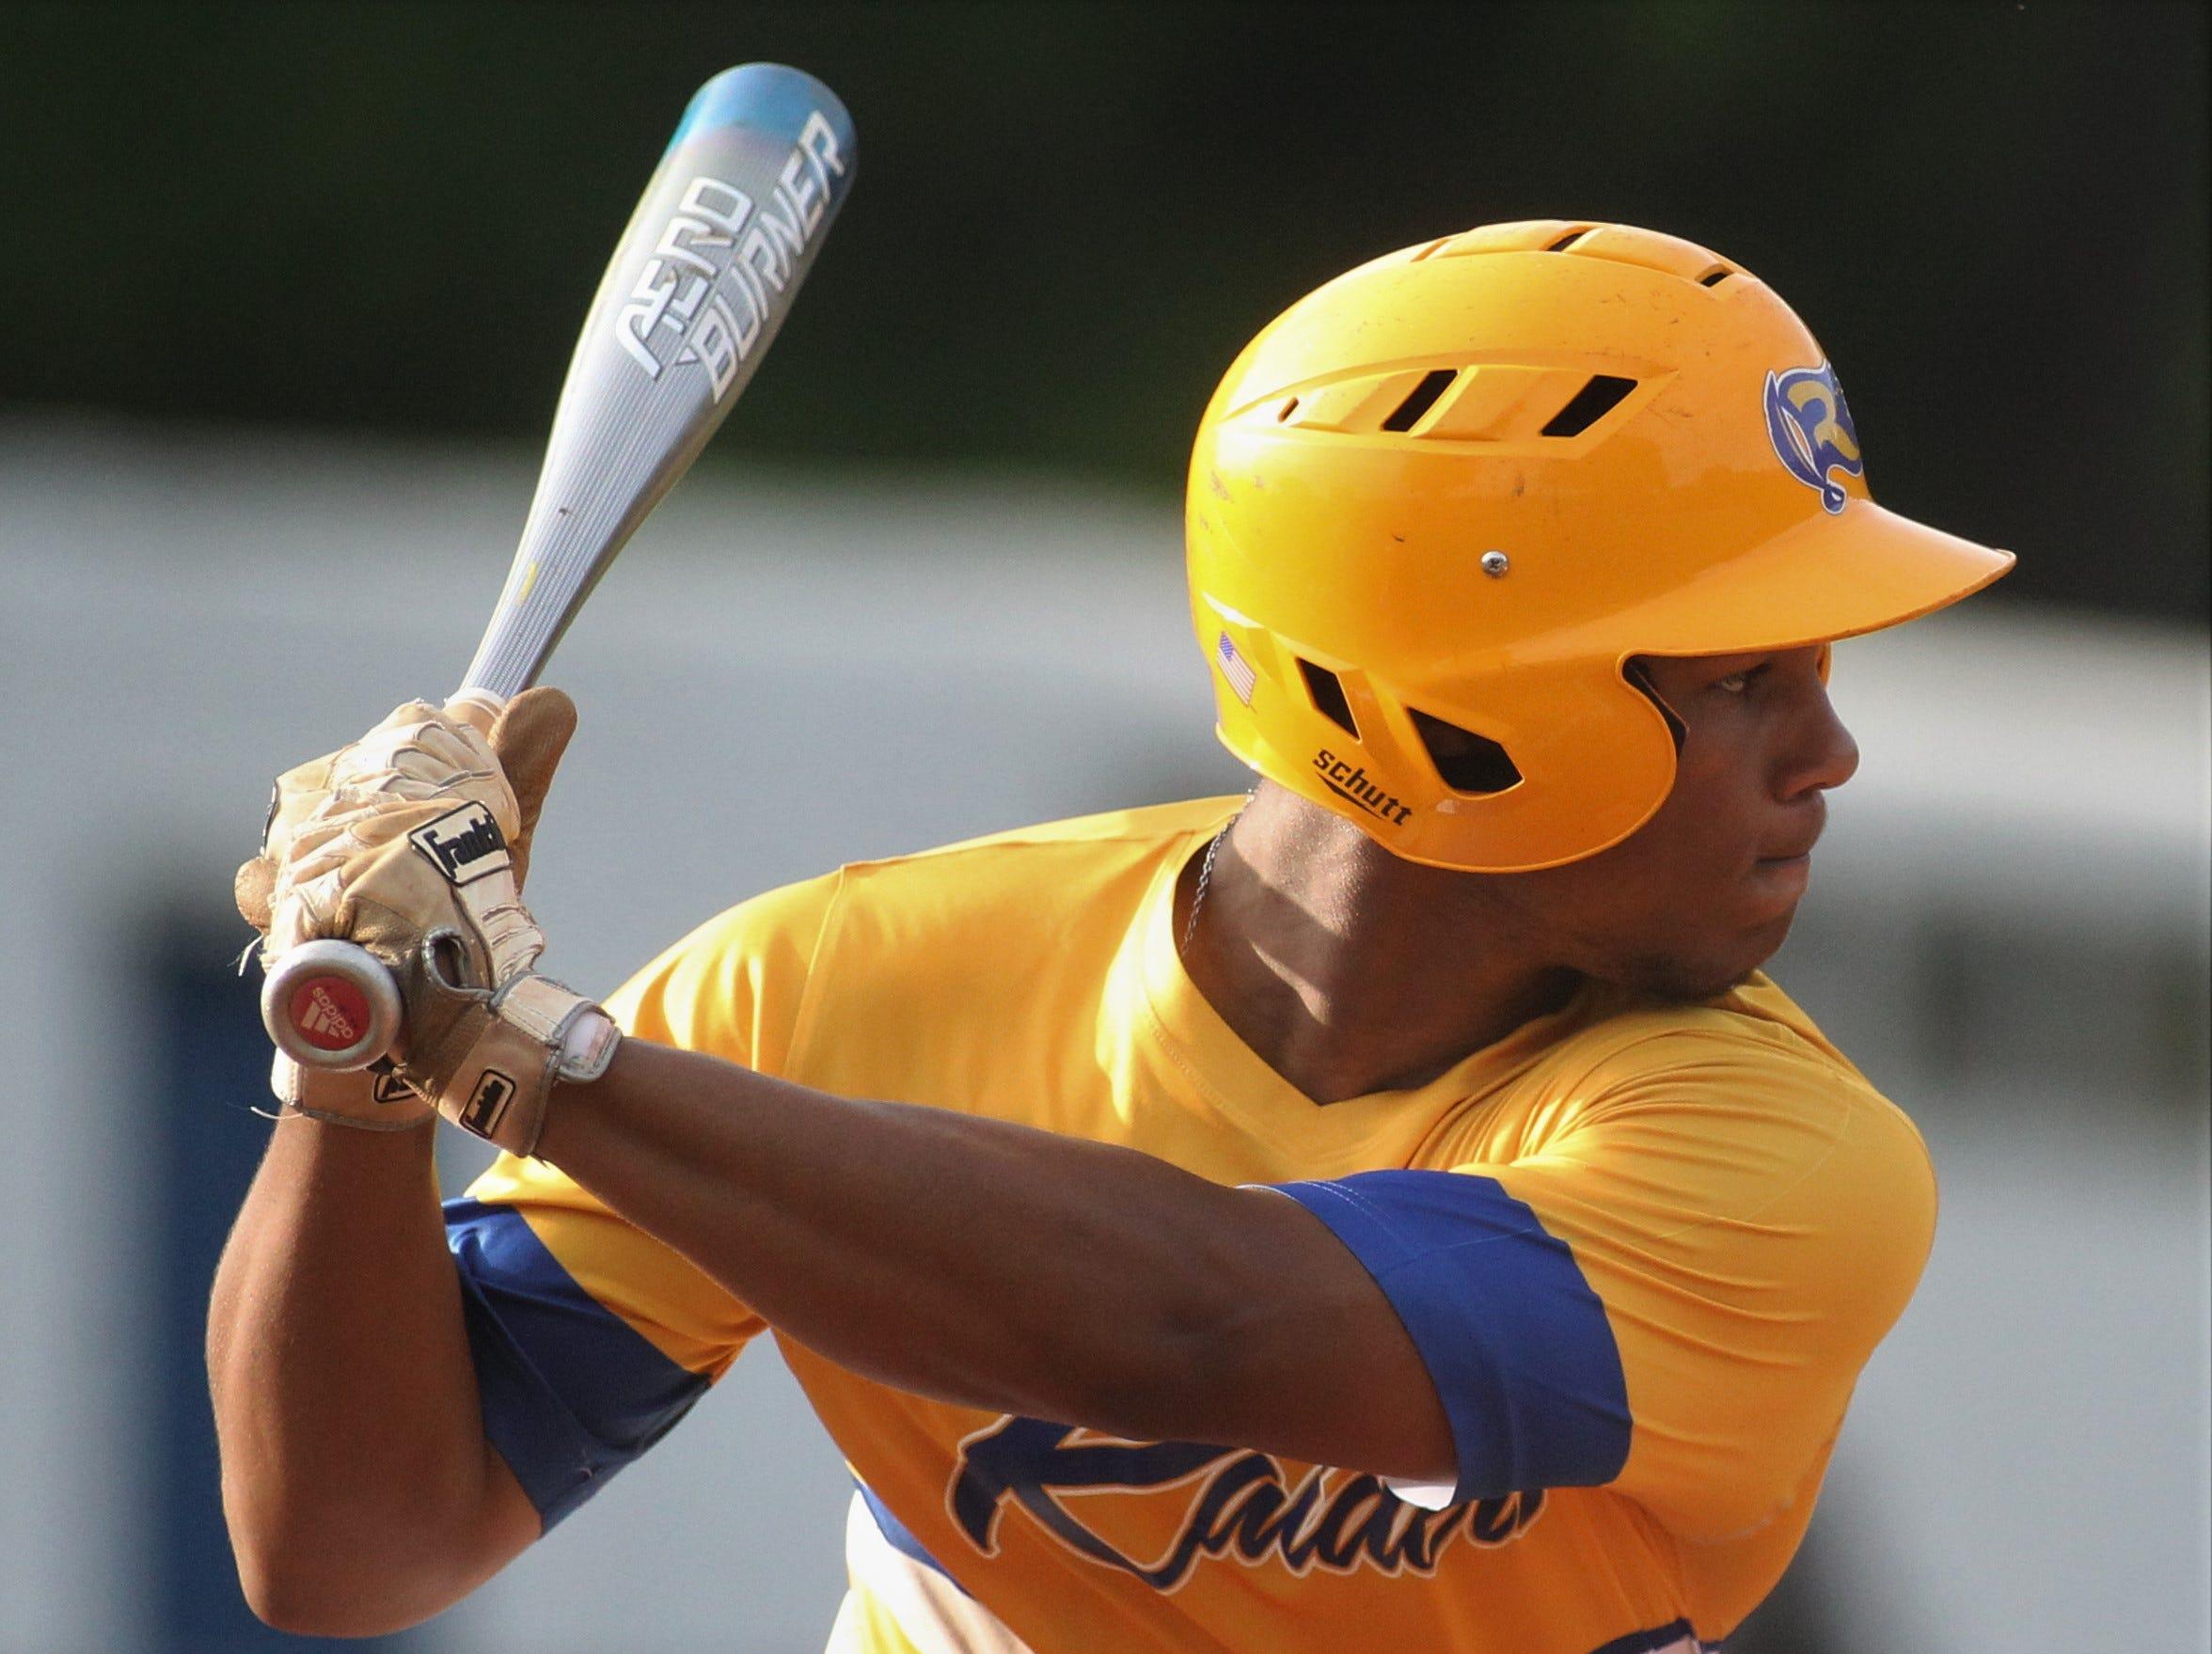 Rickards sophomore Will Brown bats as Rickards beat Gadsden County 18-0 in three innings on Friday, April 12, 2019.